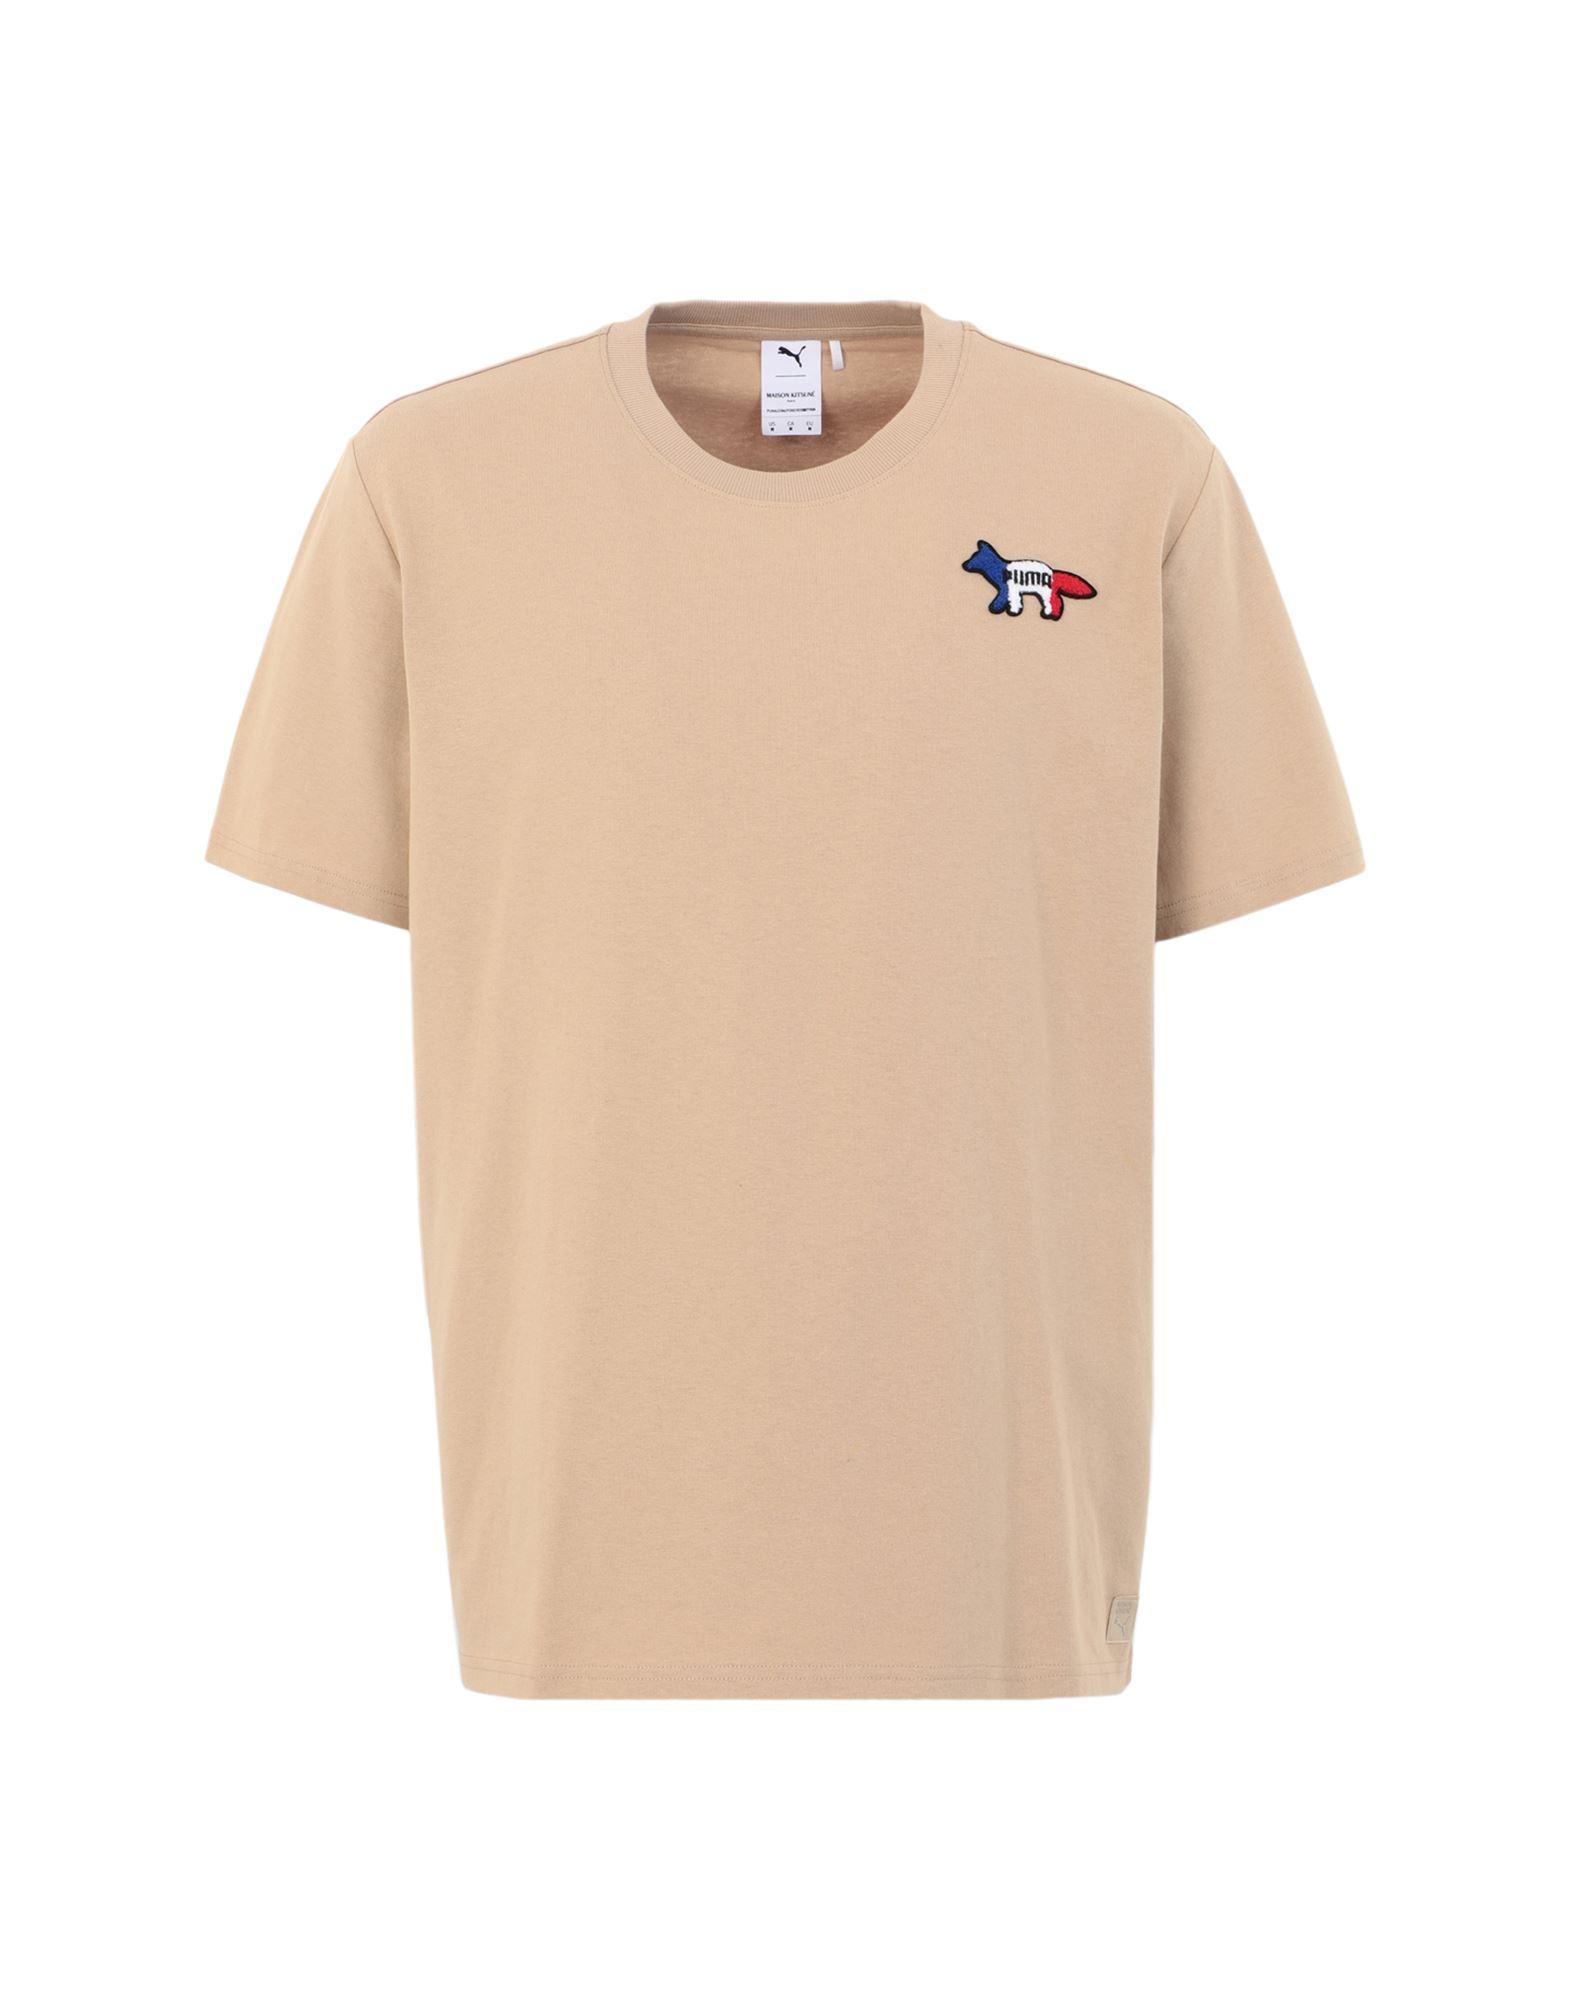 PUMA x MAISON KITSUNÉ Футболка maison kitsuné футболка